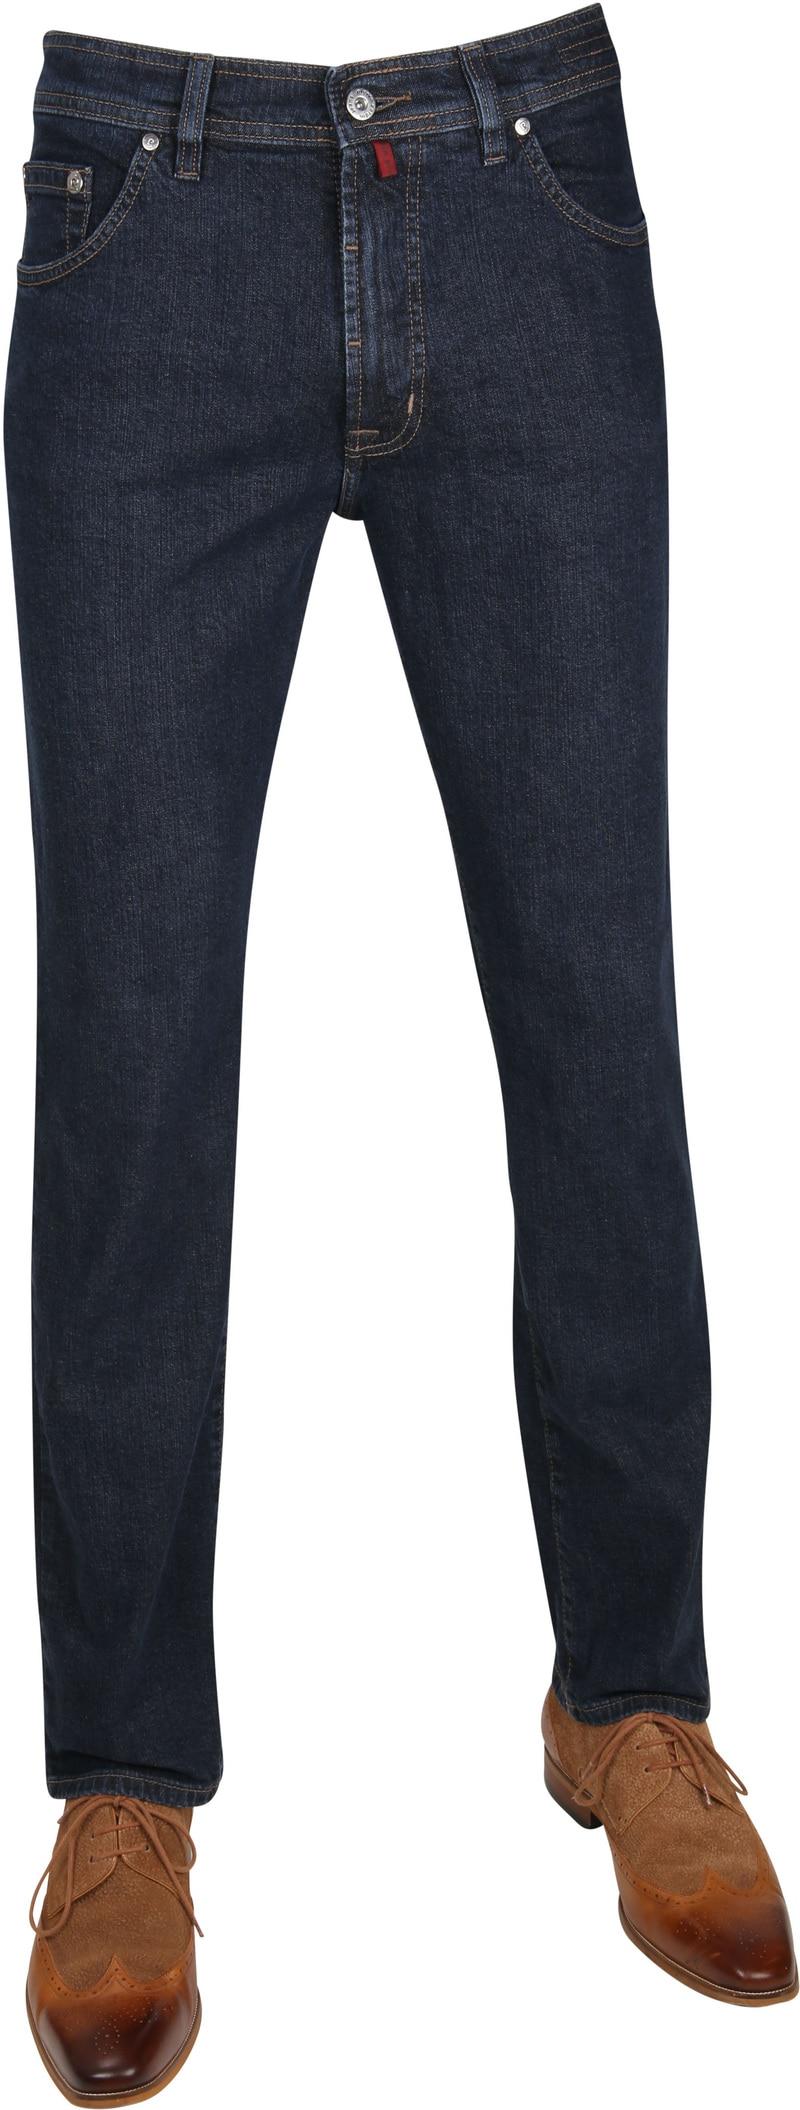 Pierre Cardin Jeans Dijon Navy photo 0